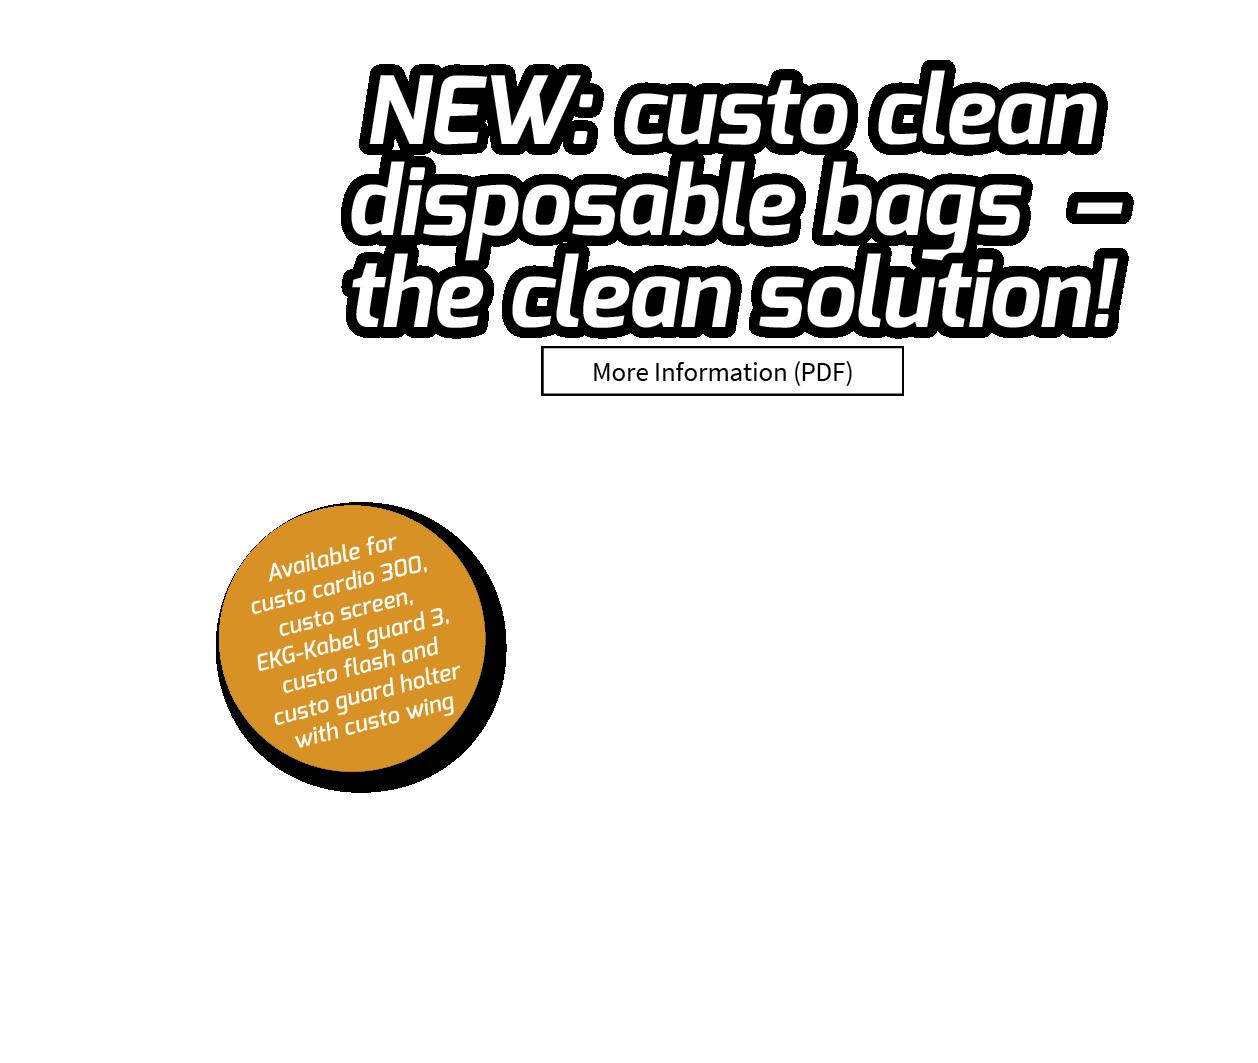 custo clean